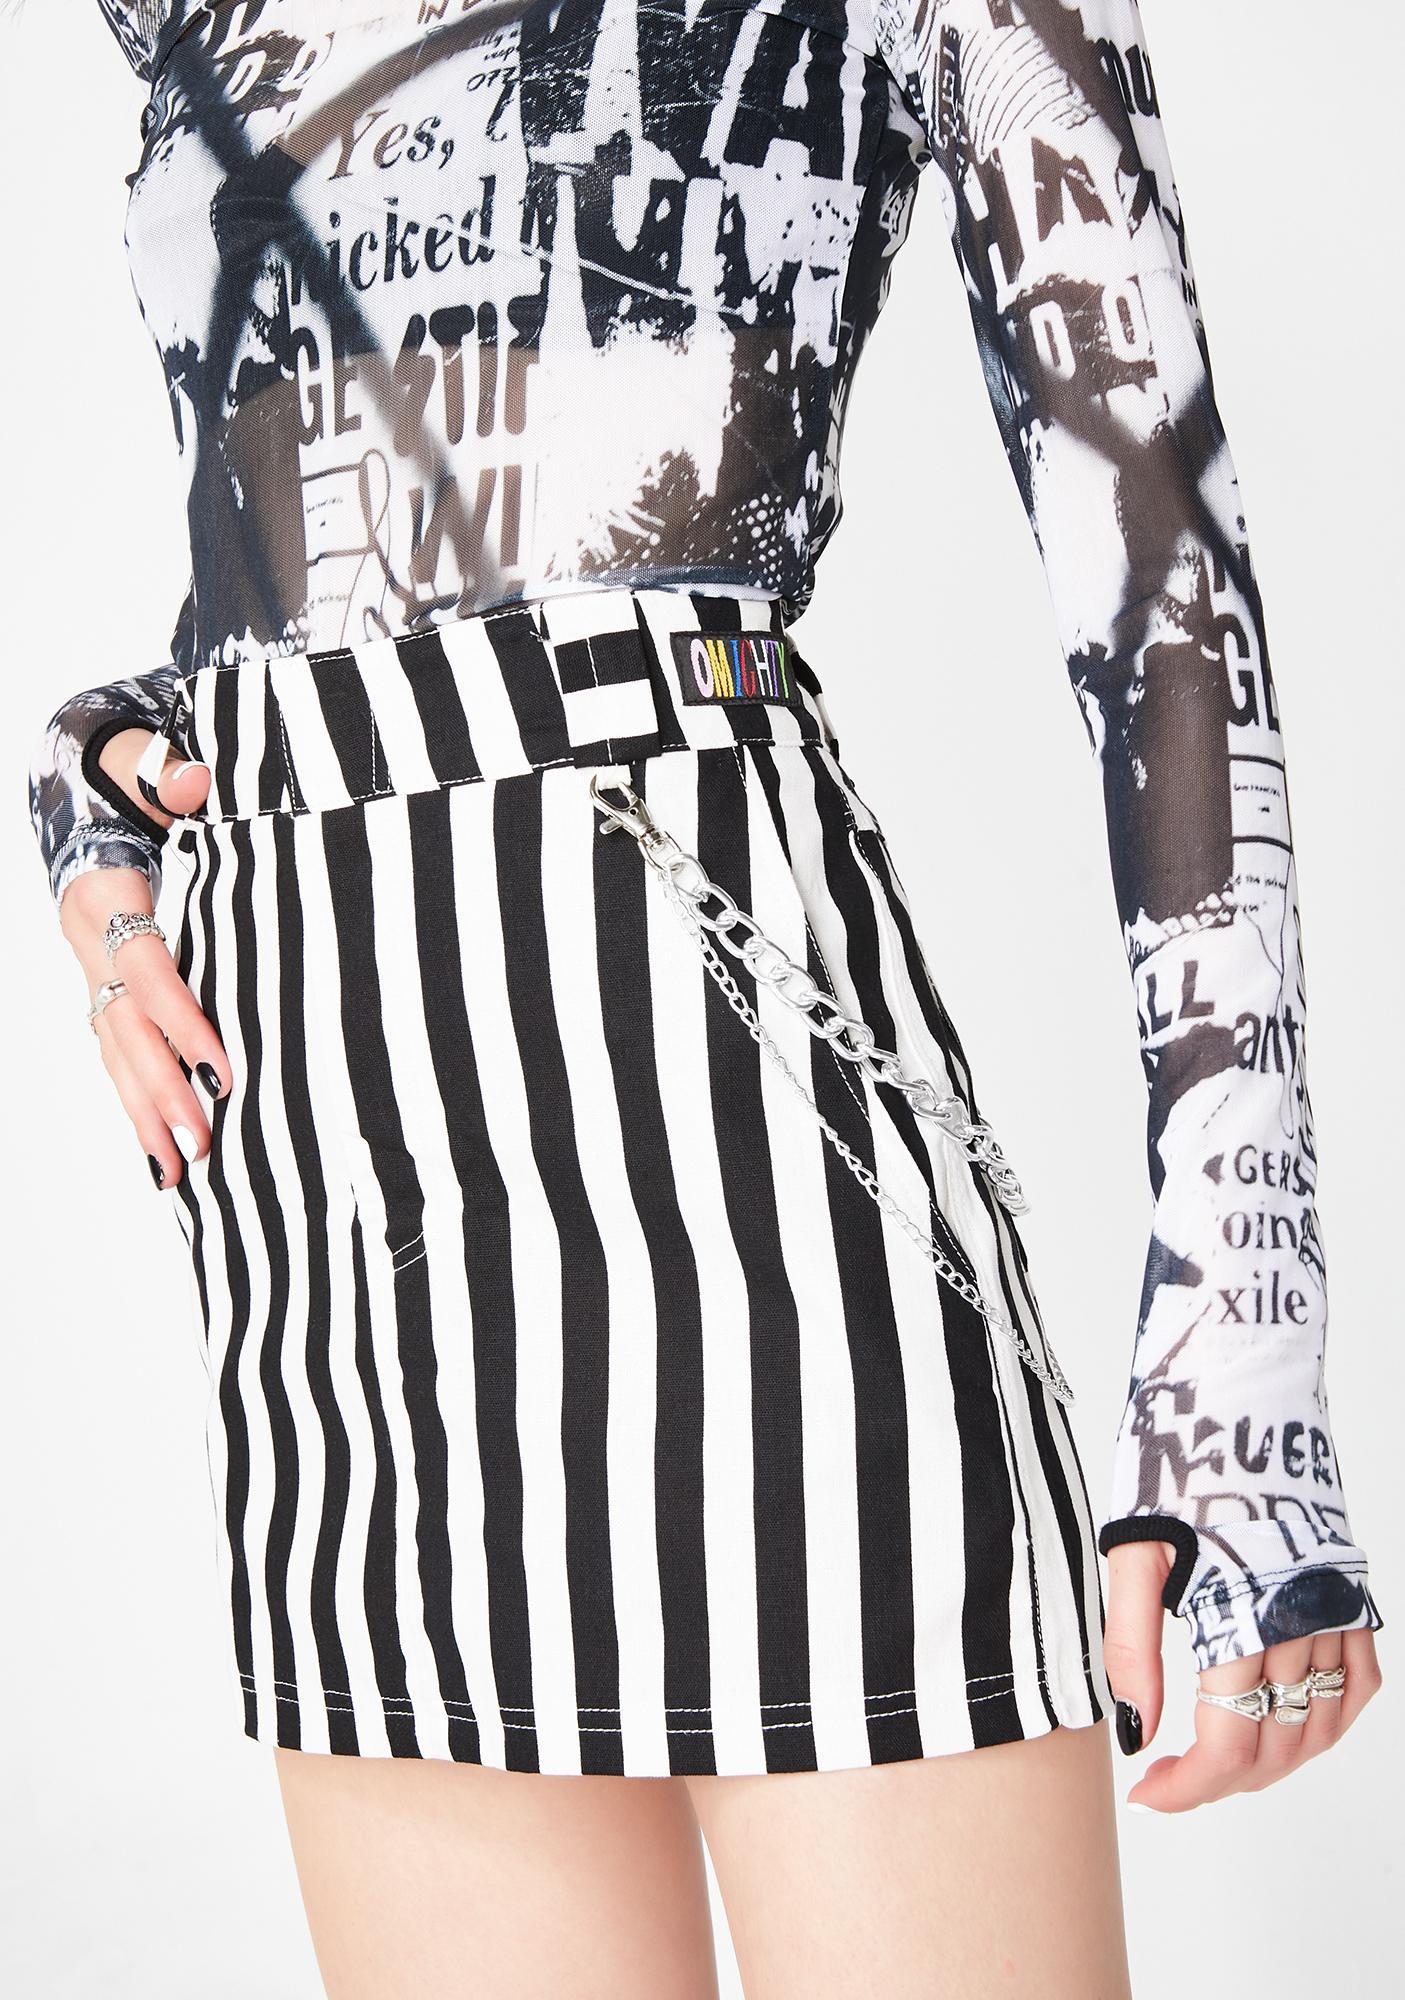 O Mighty Beetle Juice Chain Skirt